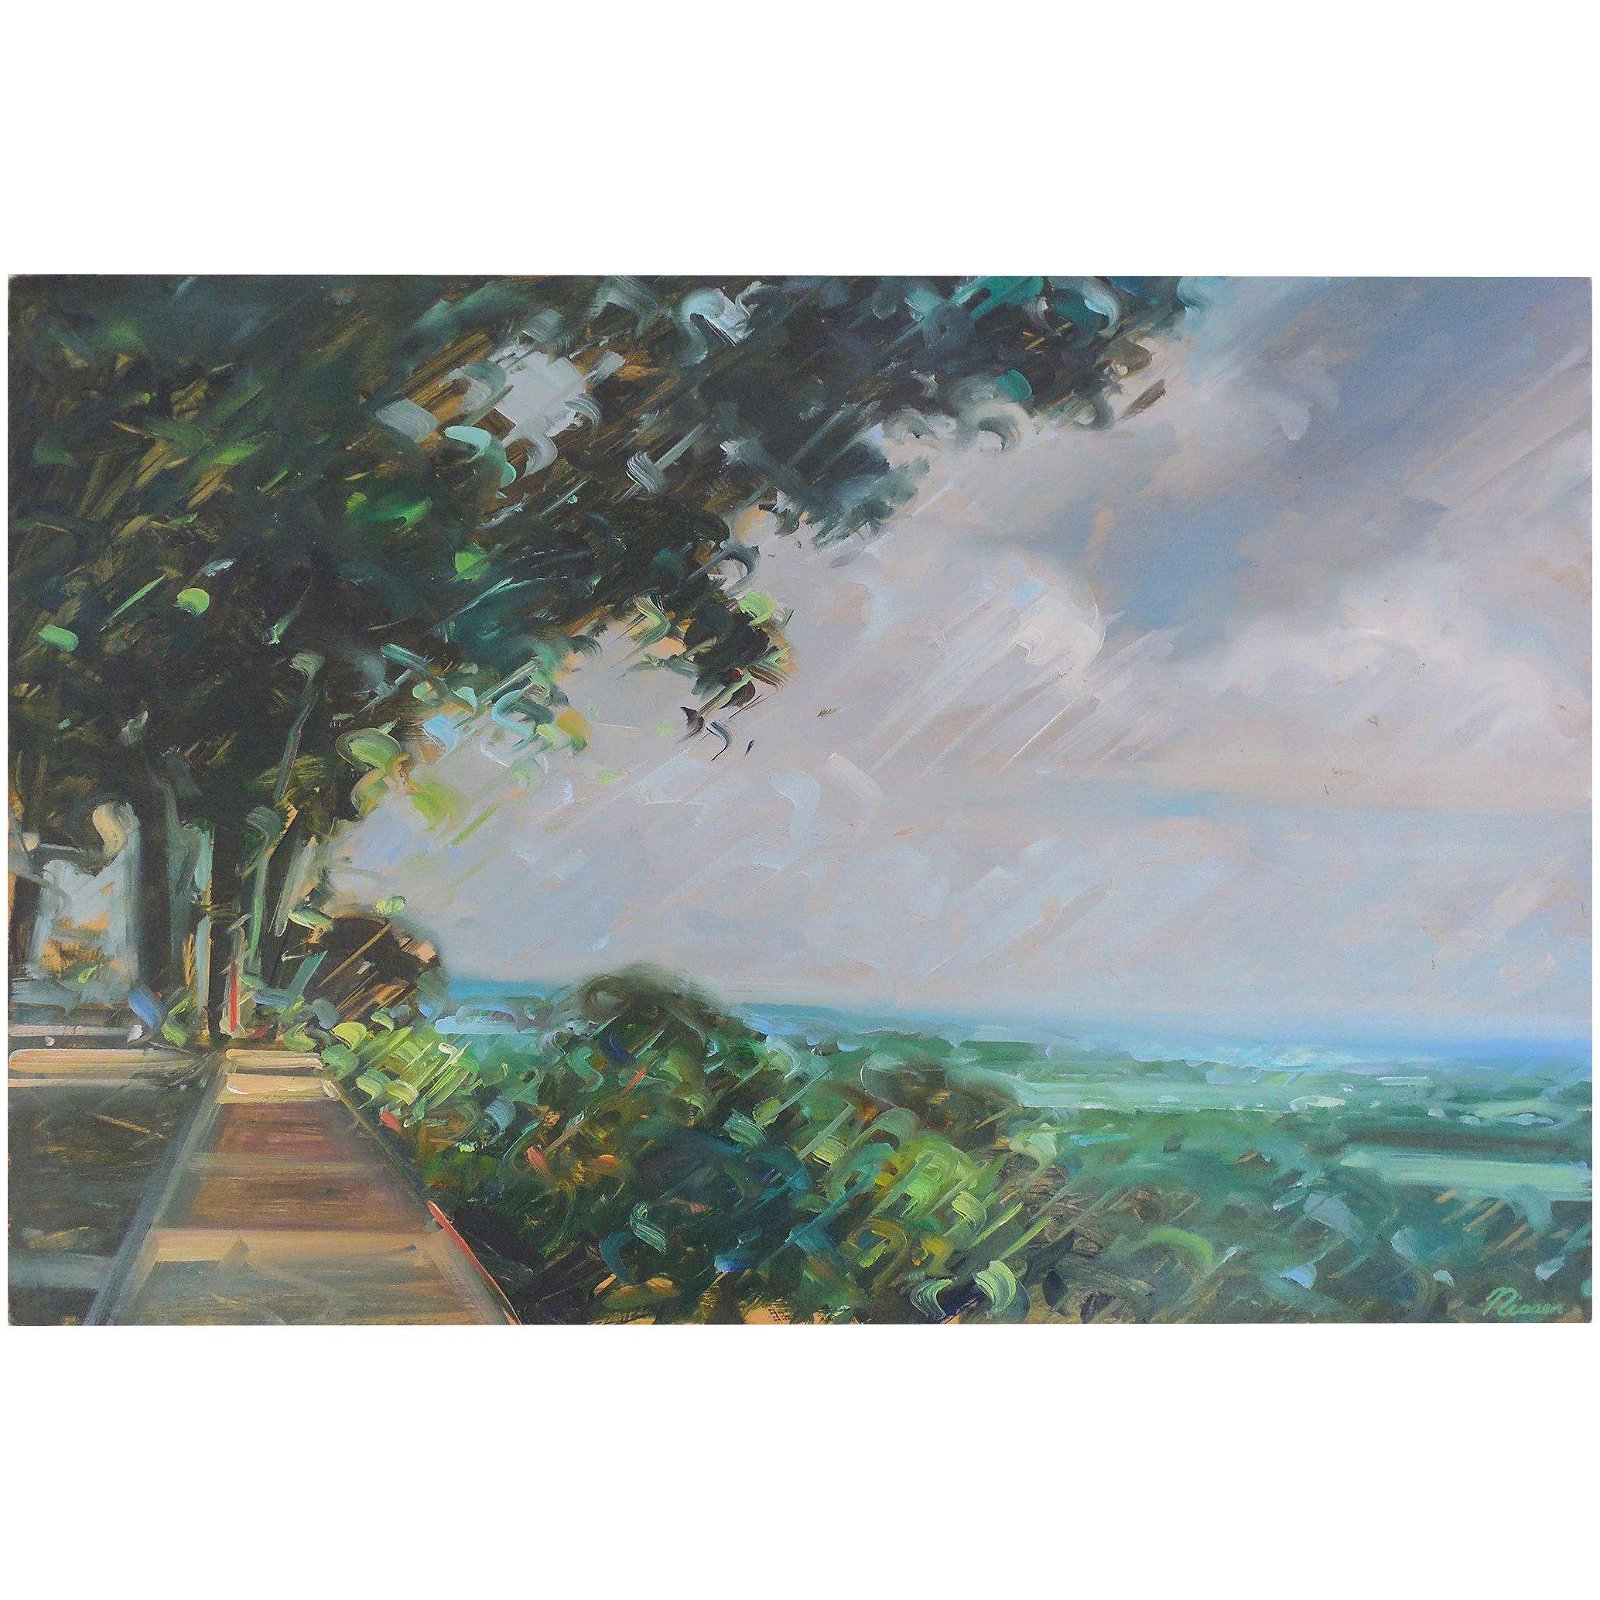 Chris Nissen (American, 1949) Seascape Painting,